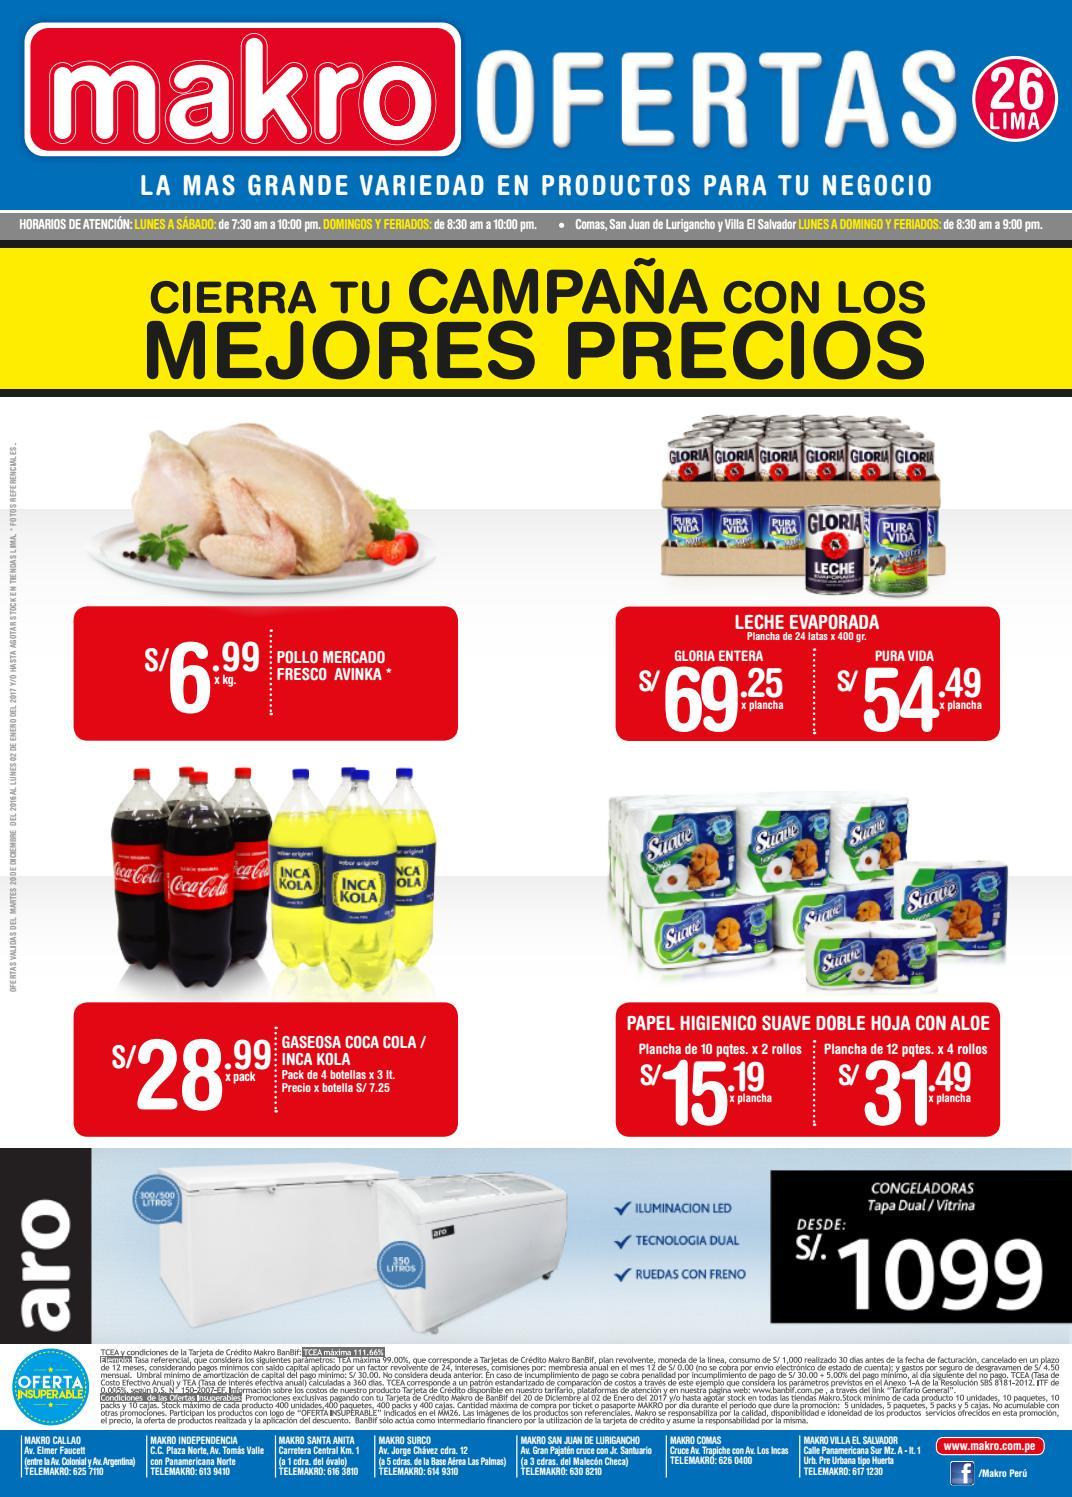 Encarte makro lima 26 by makro peru makro issuu for Makro asturias catalogo